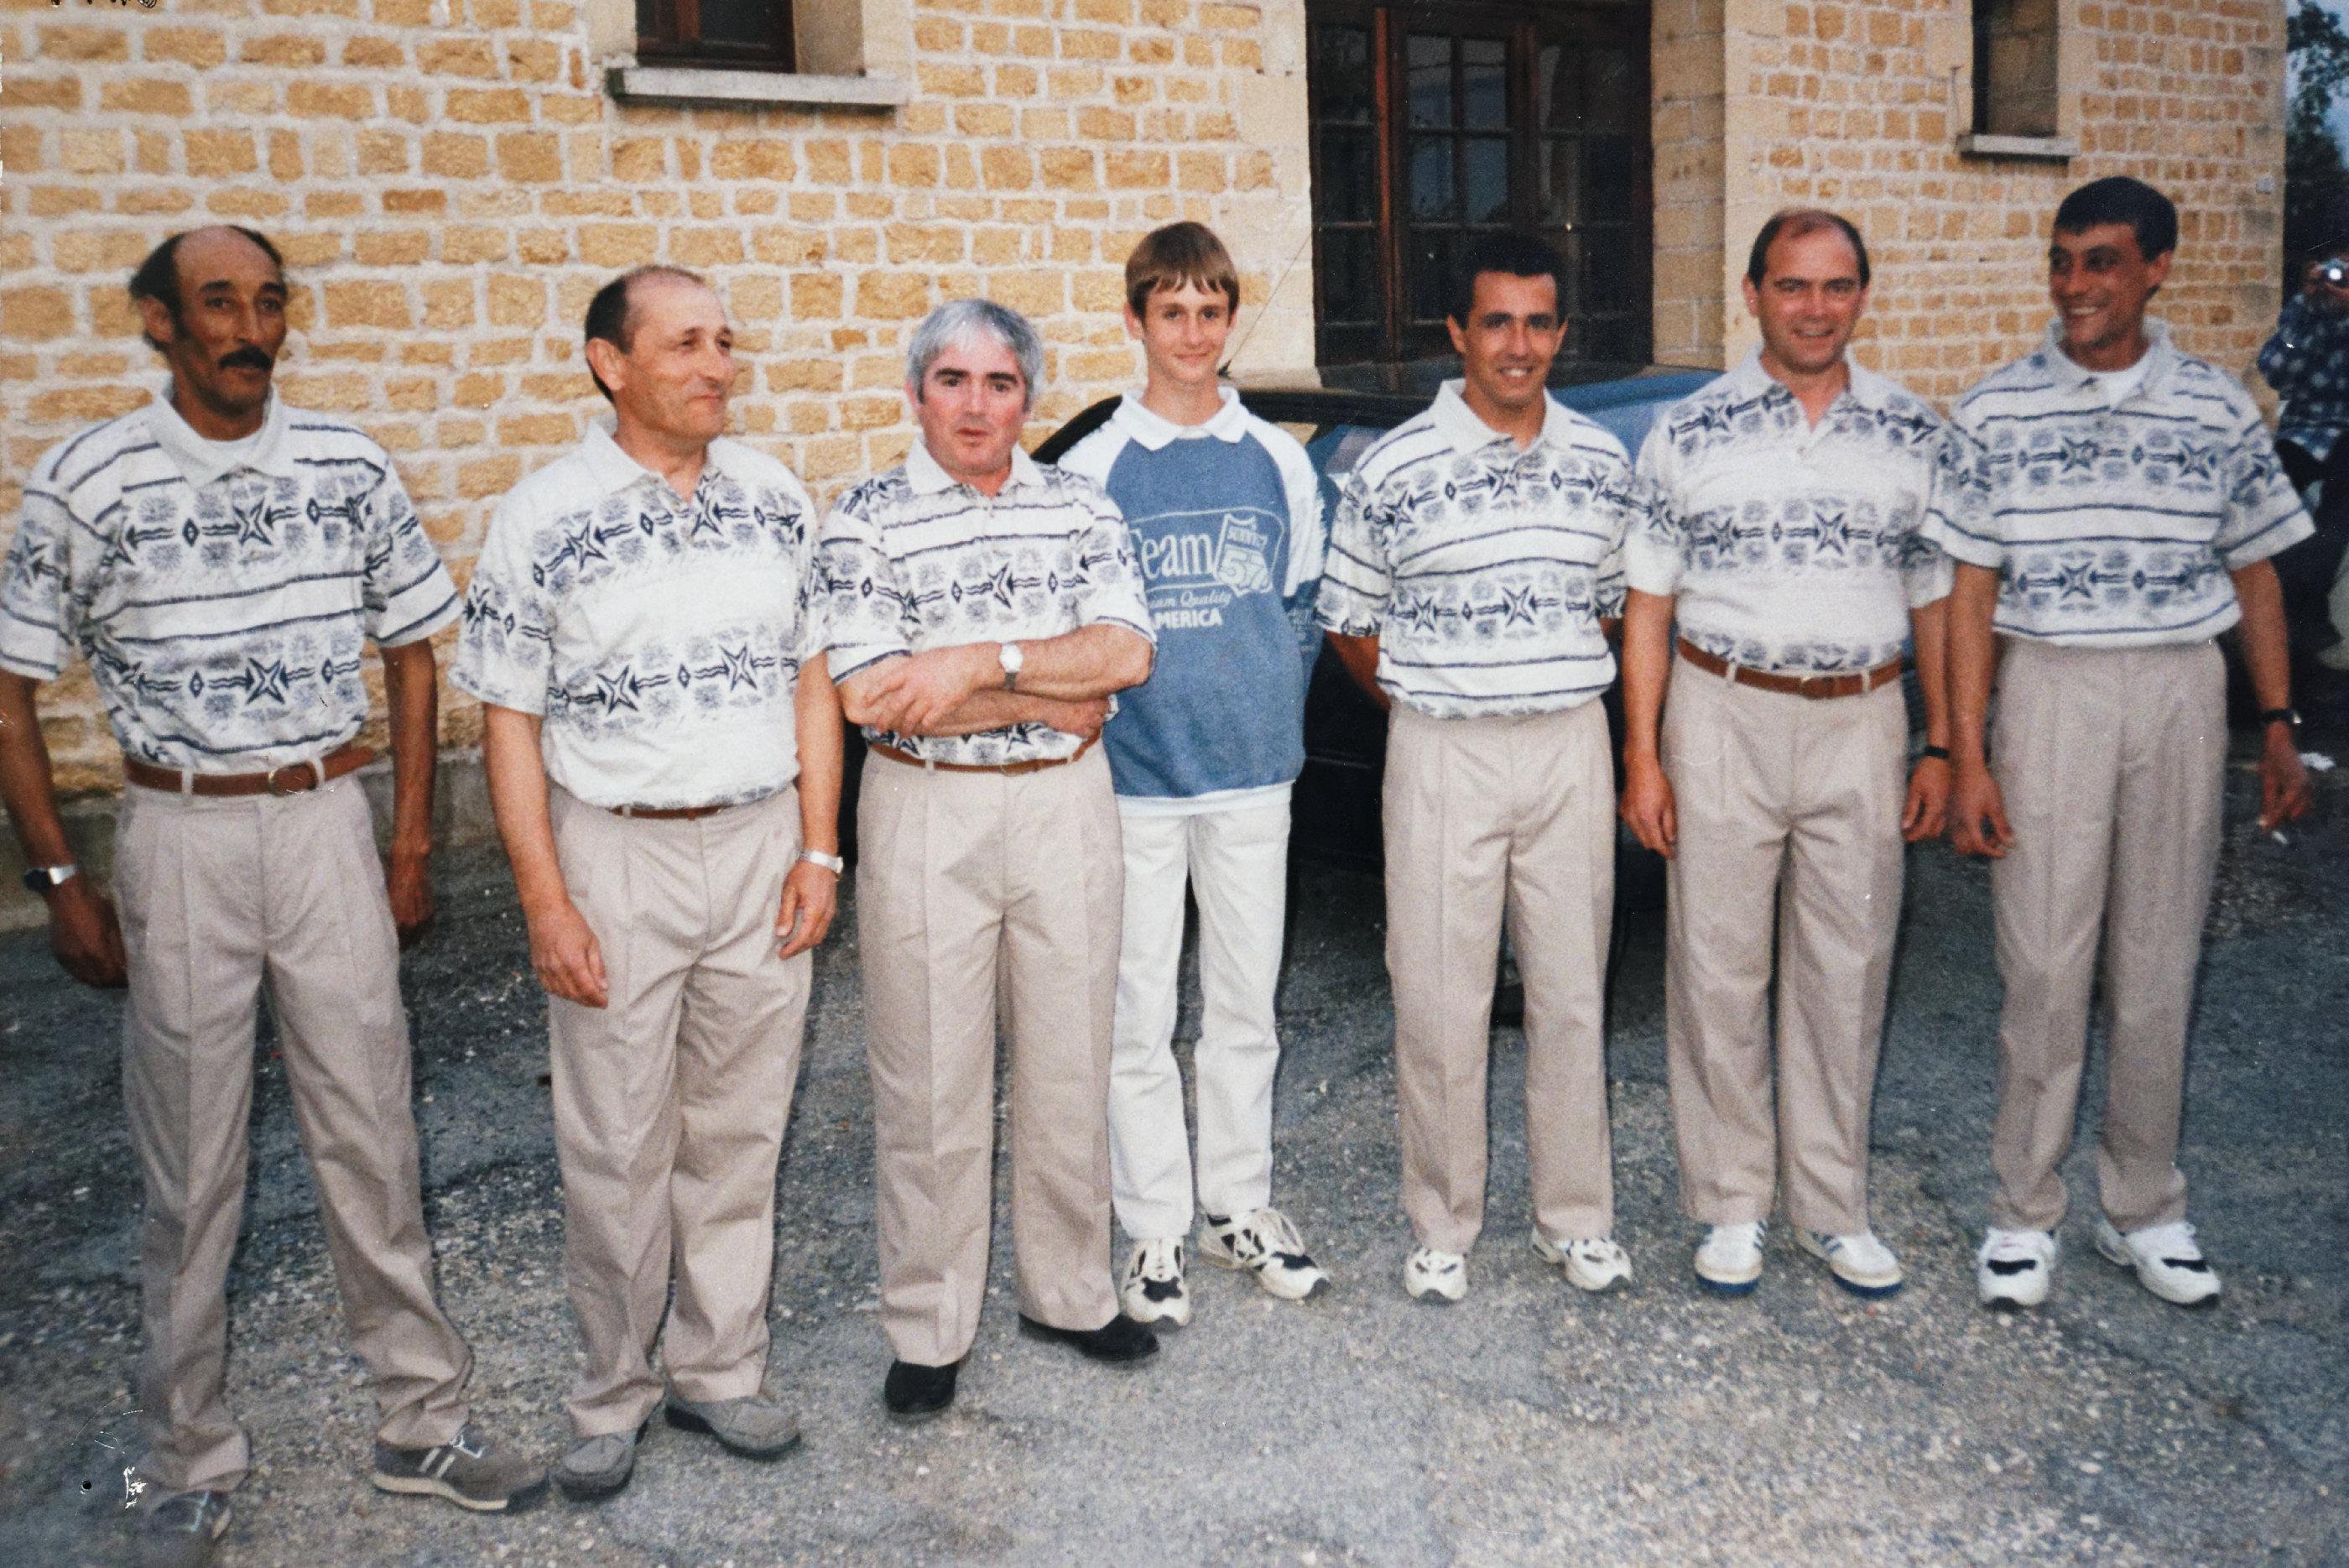 2003-05 - Agen Badel-Baroni-Campergue & Coldeboeuf-Franquet-Sanchez